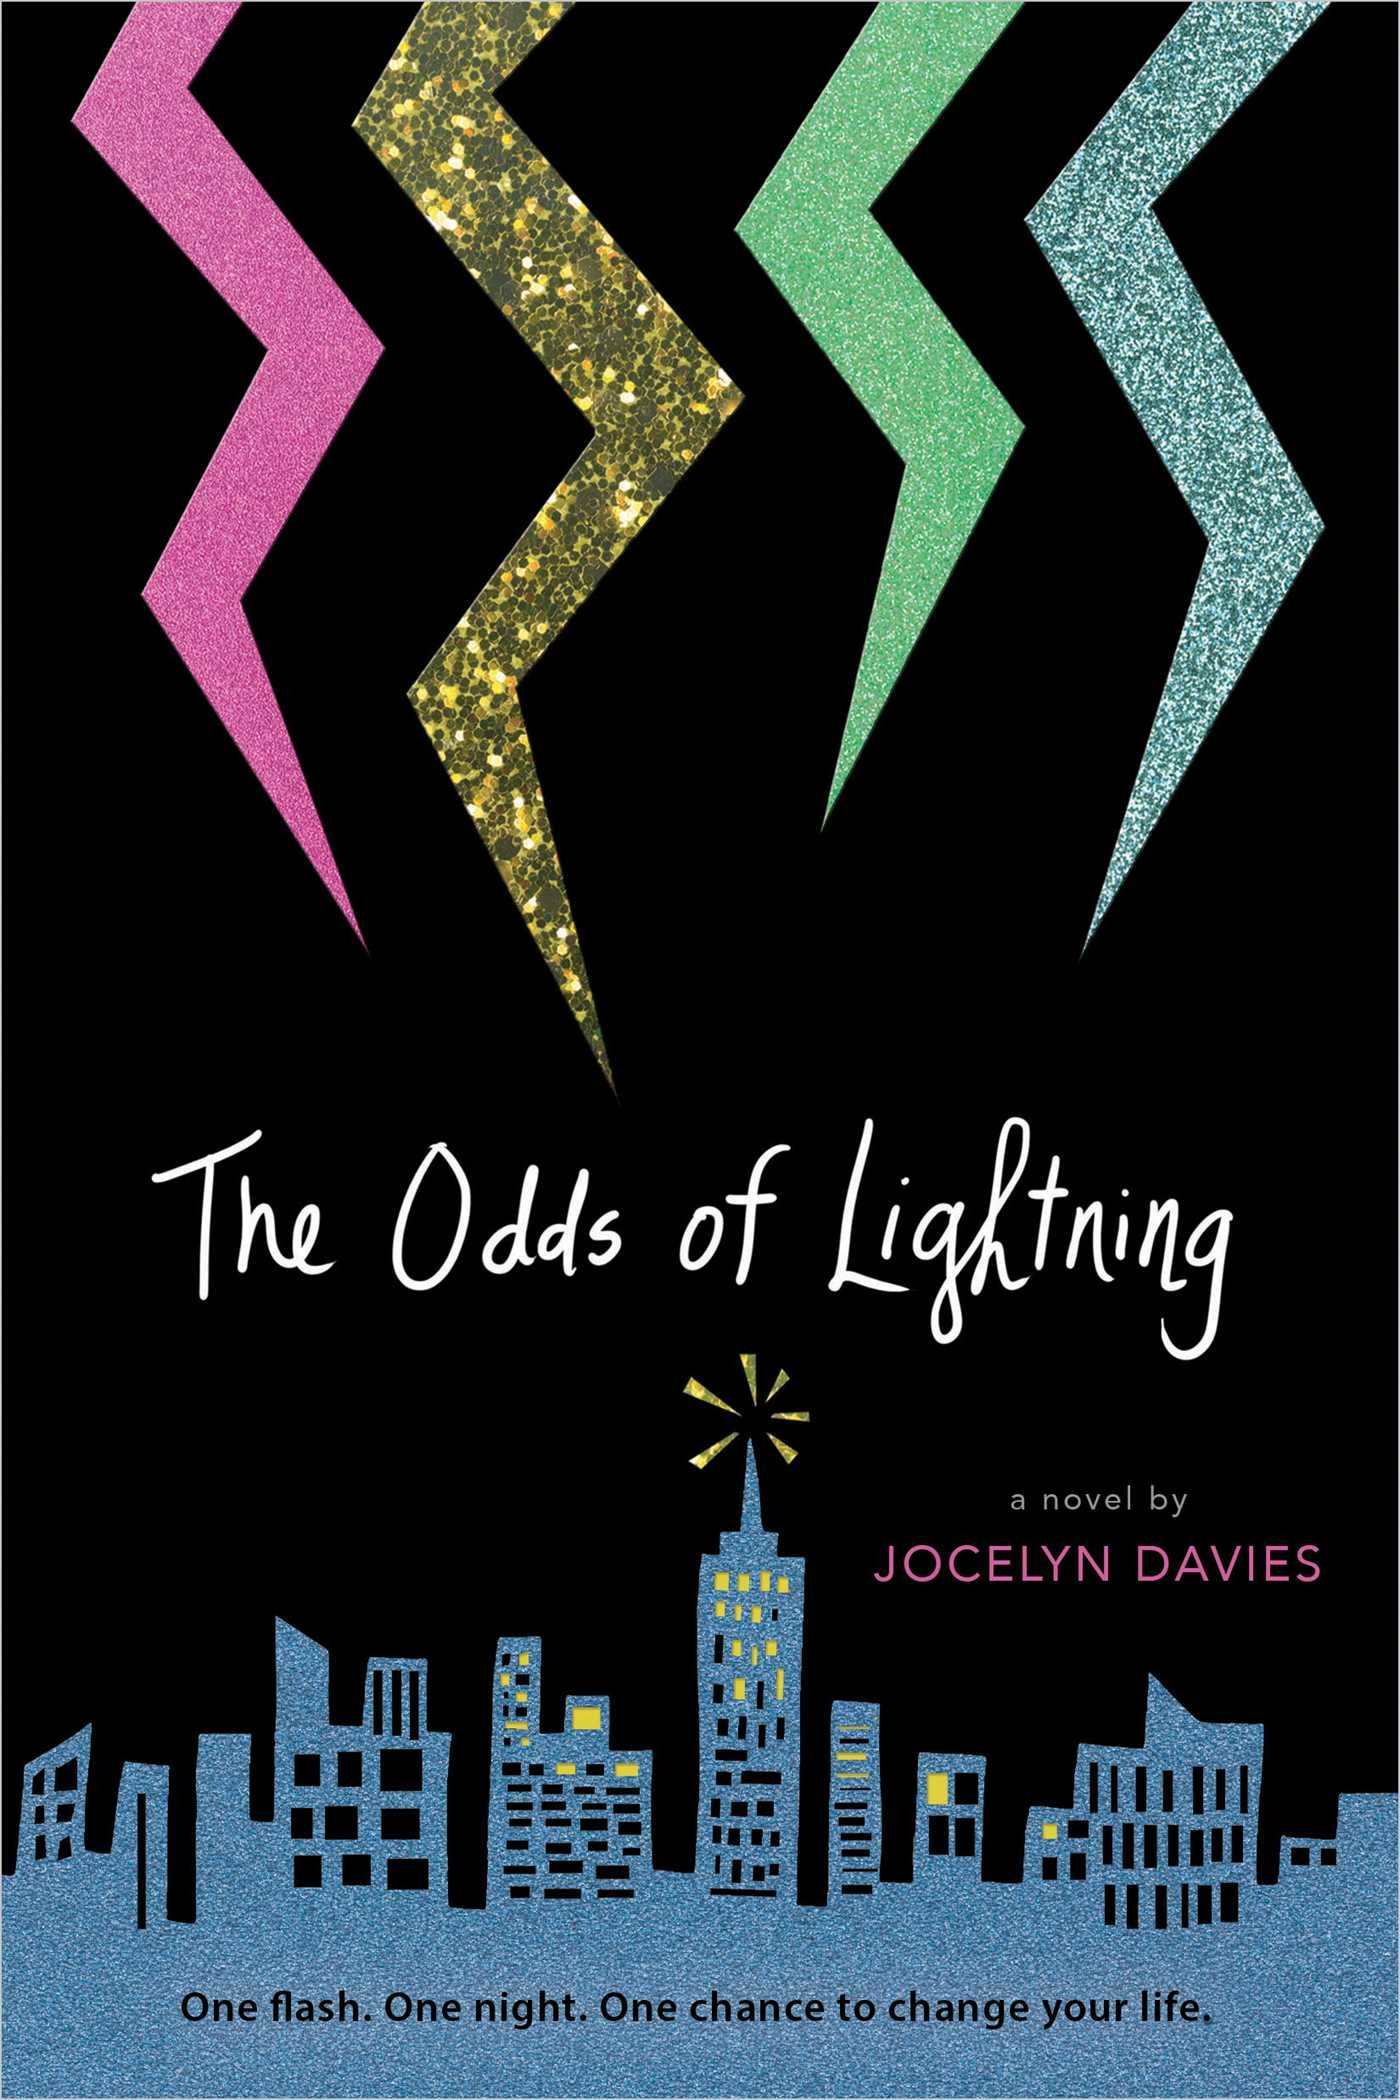 Image result for the odds of lightning jocelyn davies